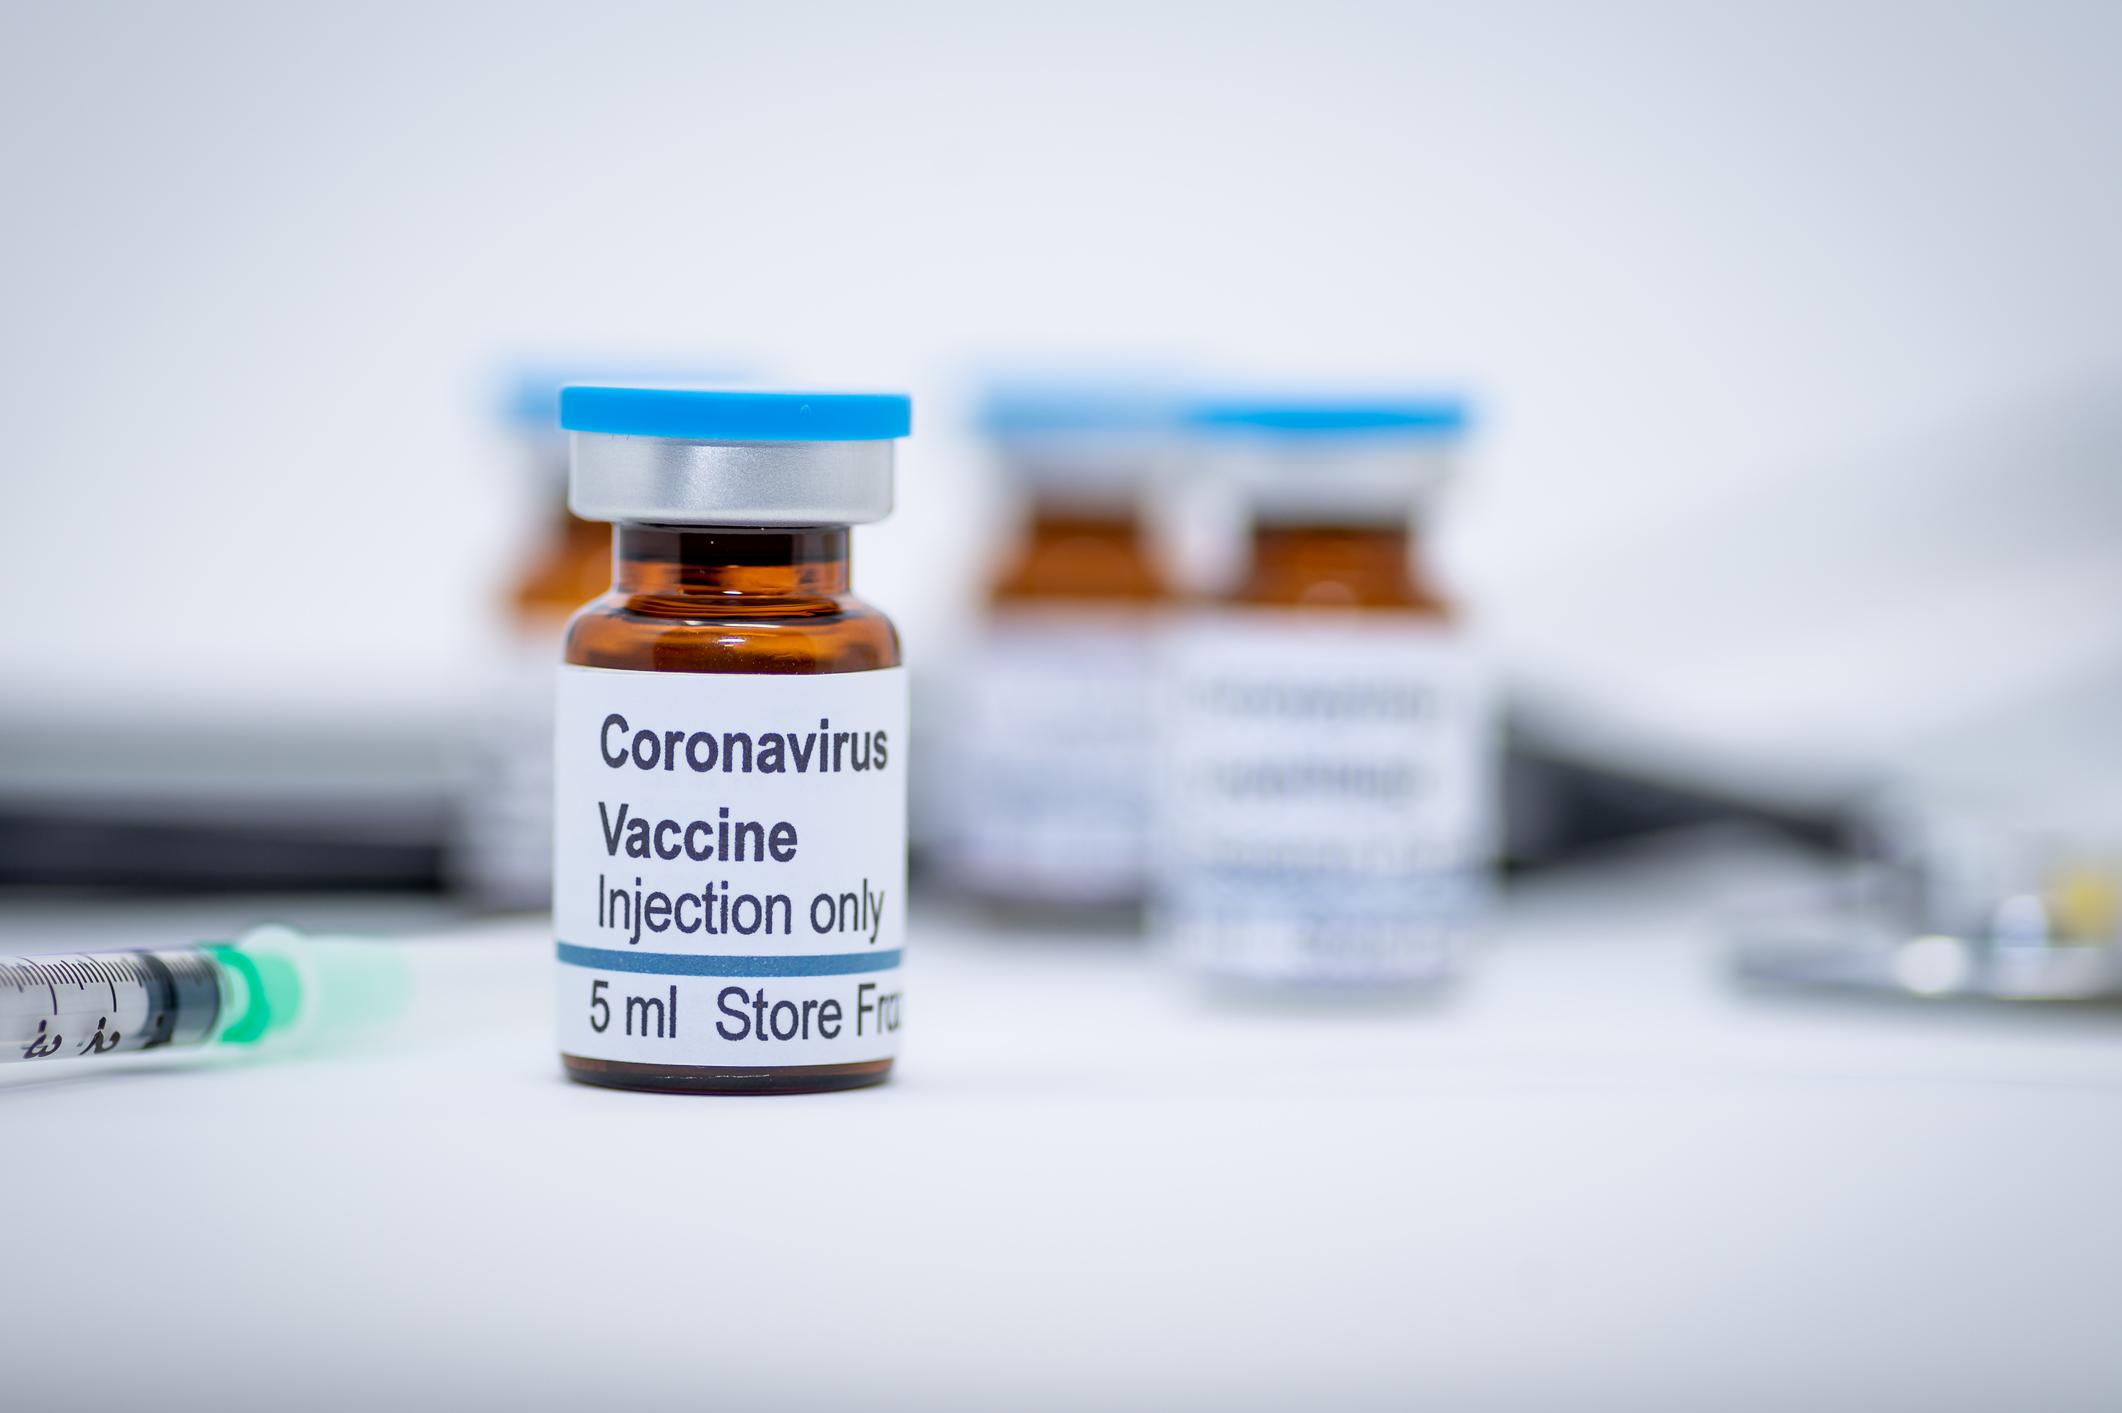 Why Inovio Pharmaceuticals Stock Is Skyrocketing Today